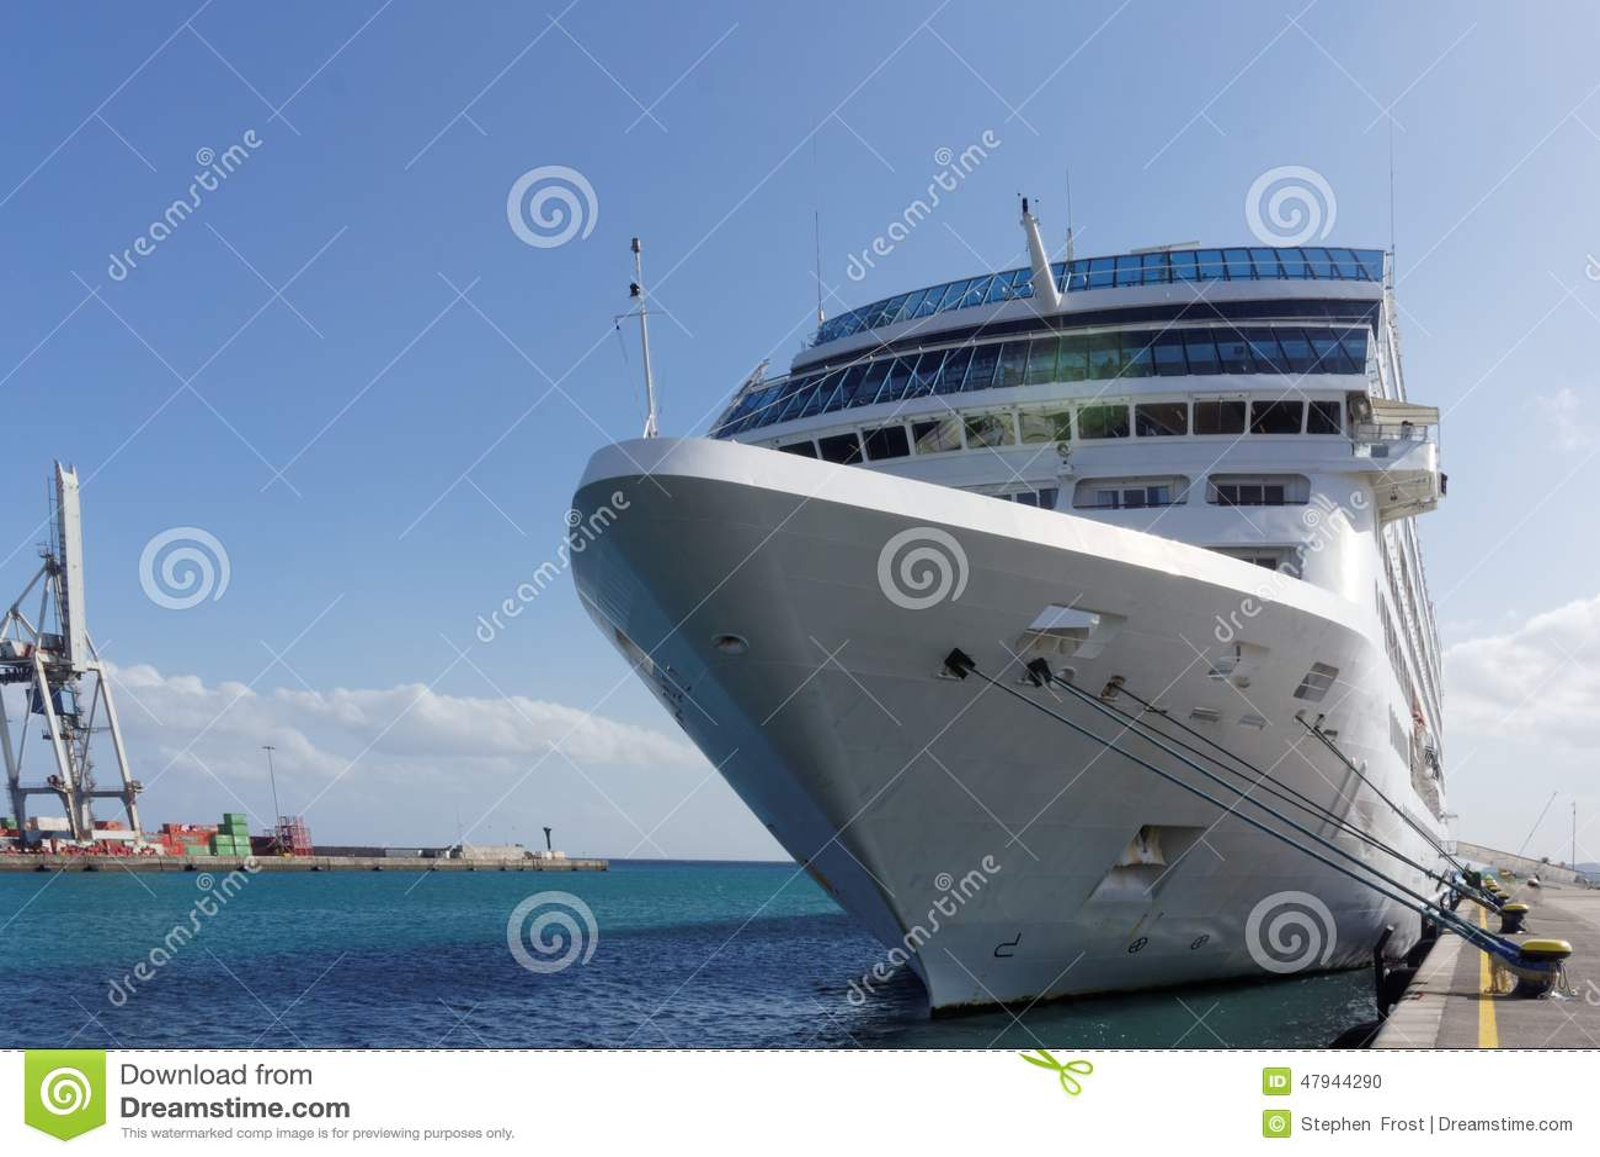 Cruise Ship In Port Stock Photo Image Of Passenger Adonia - Example of cruise ship